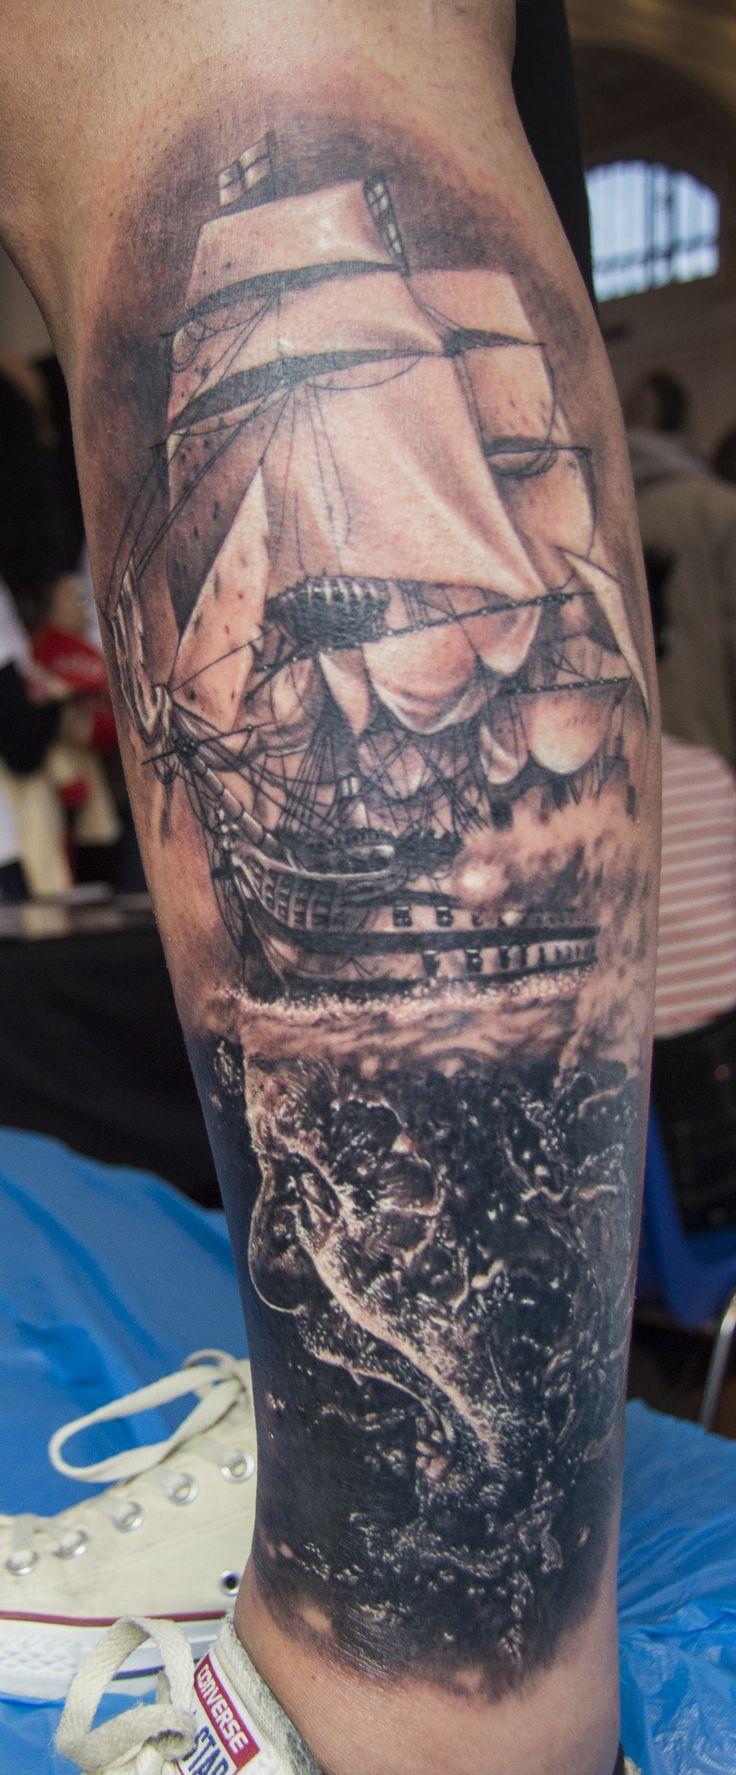 Made by Brown & Black Tattoo Studio (Ljubljana, Slovenia) at the Trieste Tattoo Expo 2016